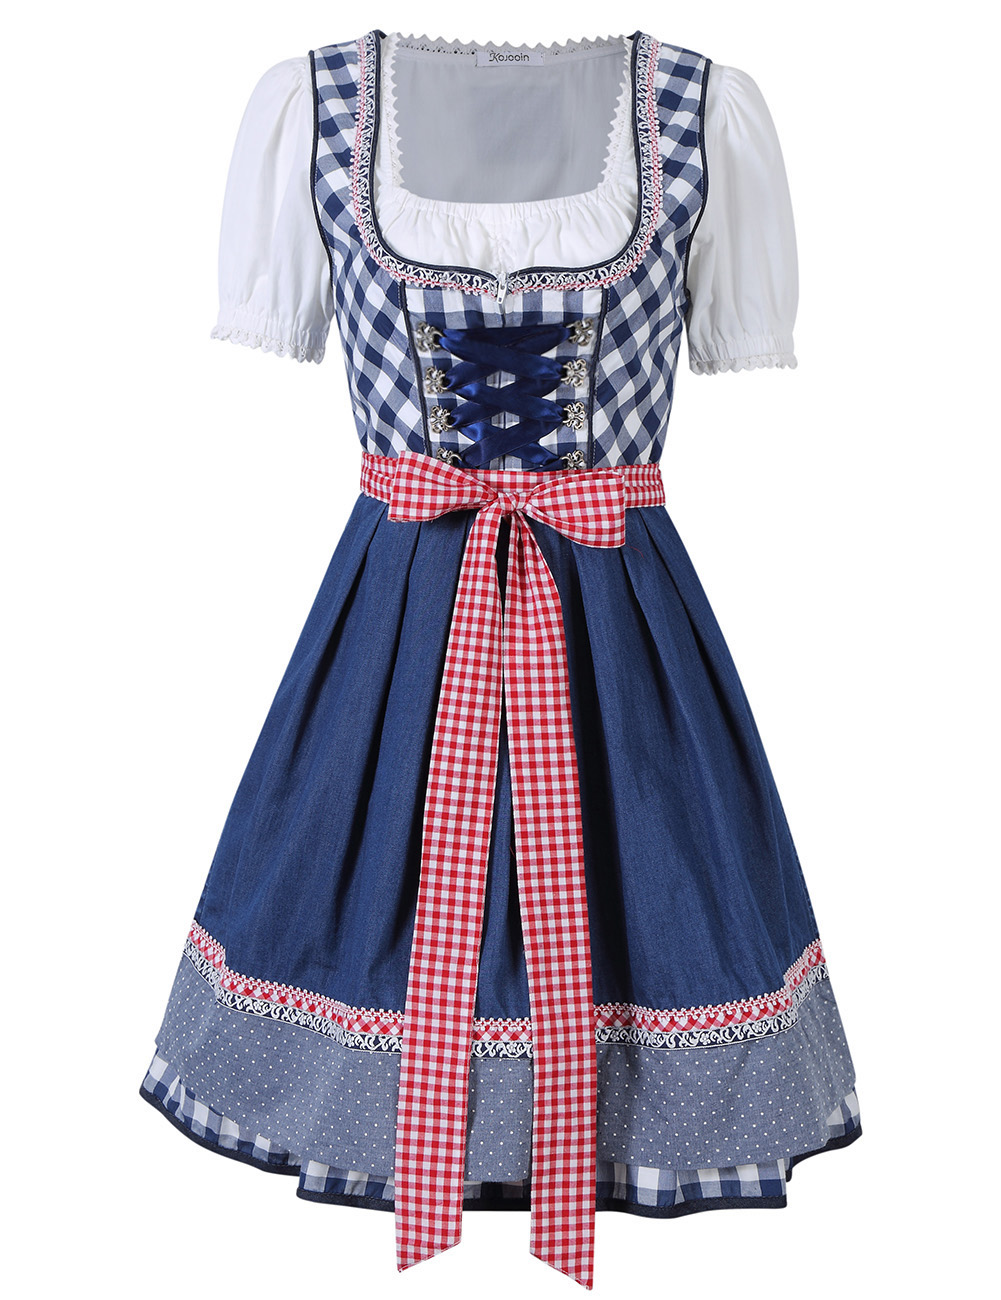 [EU Direct] Kojooin Women 3 Pieces Bavarian Oktoberfest Costumes Barmaid Dirndl Dress Blue_Forty-two